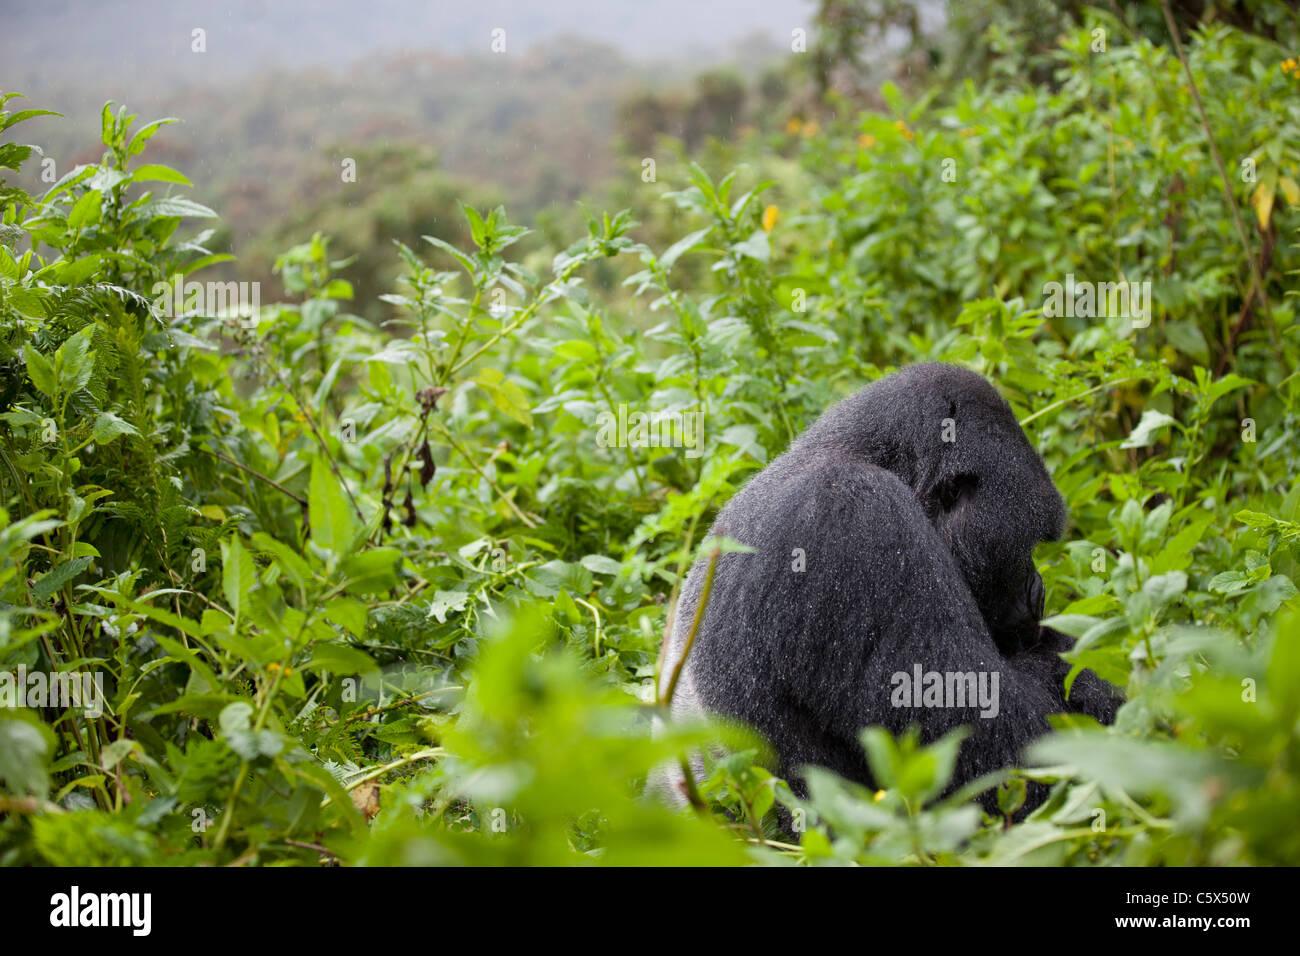 Silverback Gorilla in Rwanda sitting in the rain. - Stock Image